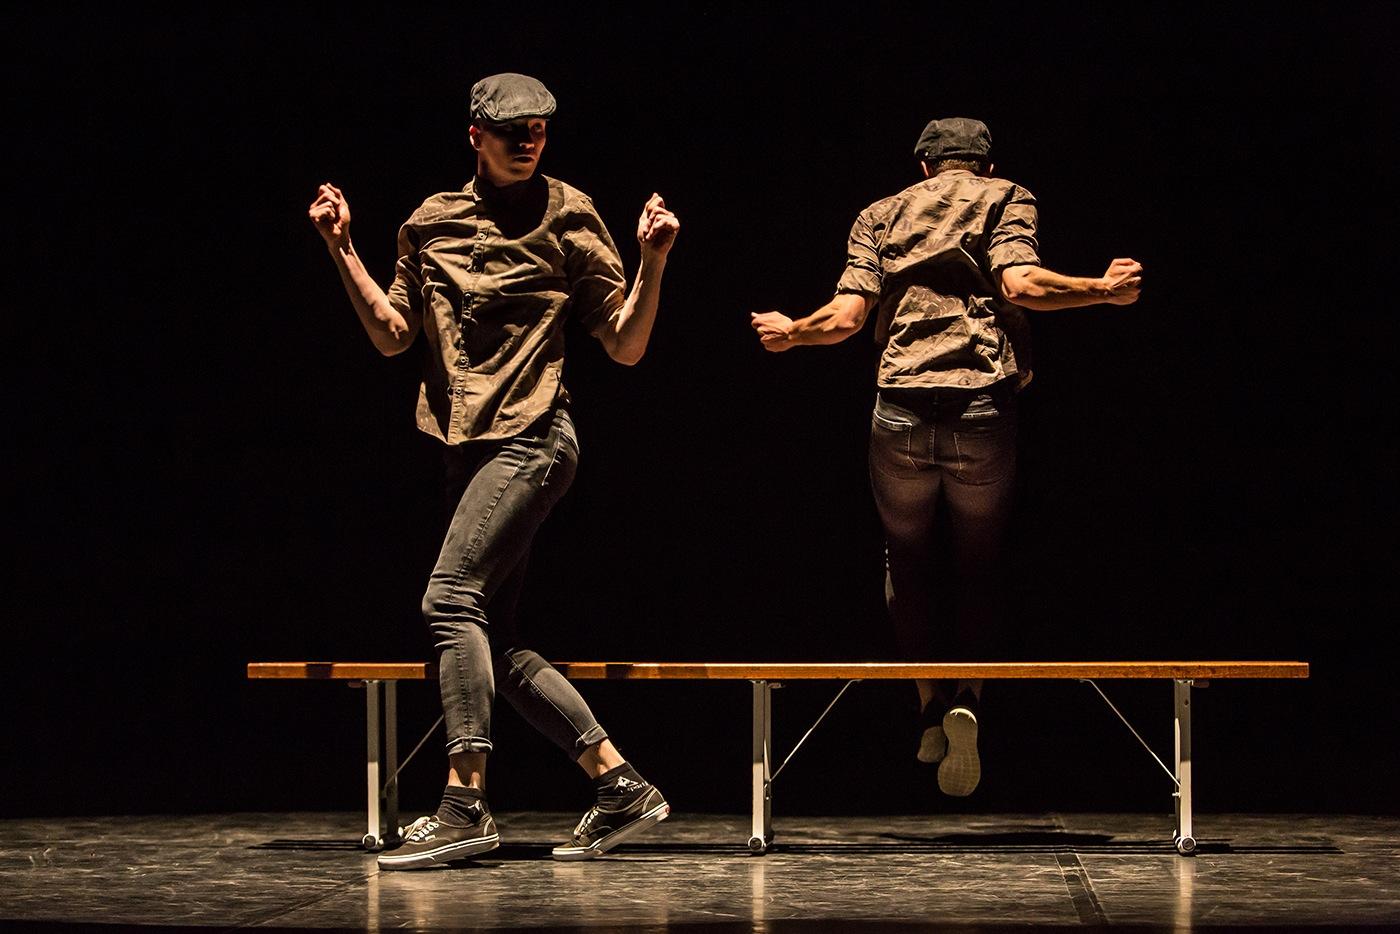 photographe-reportage-danse-avec-ton-crous-guillaume-heraud-035-small